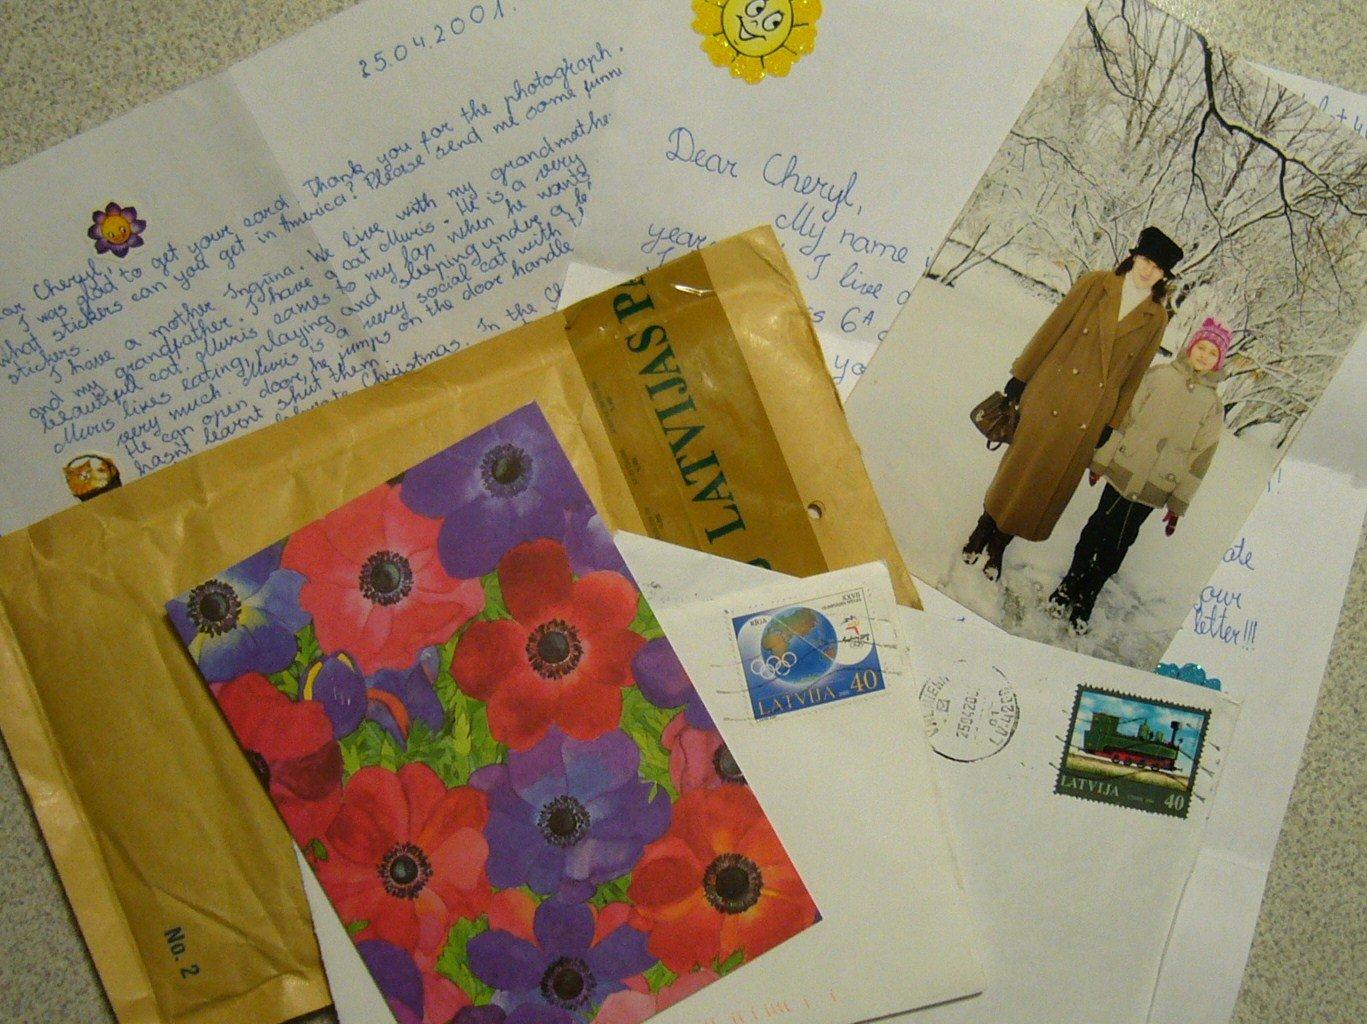 Operation Christmas Child Letter Samples Awesome Simply Shoeboxes Operation Christmas Child Packing